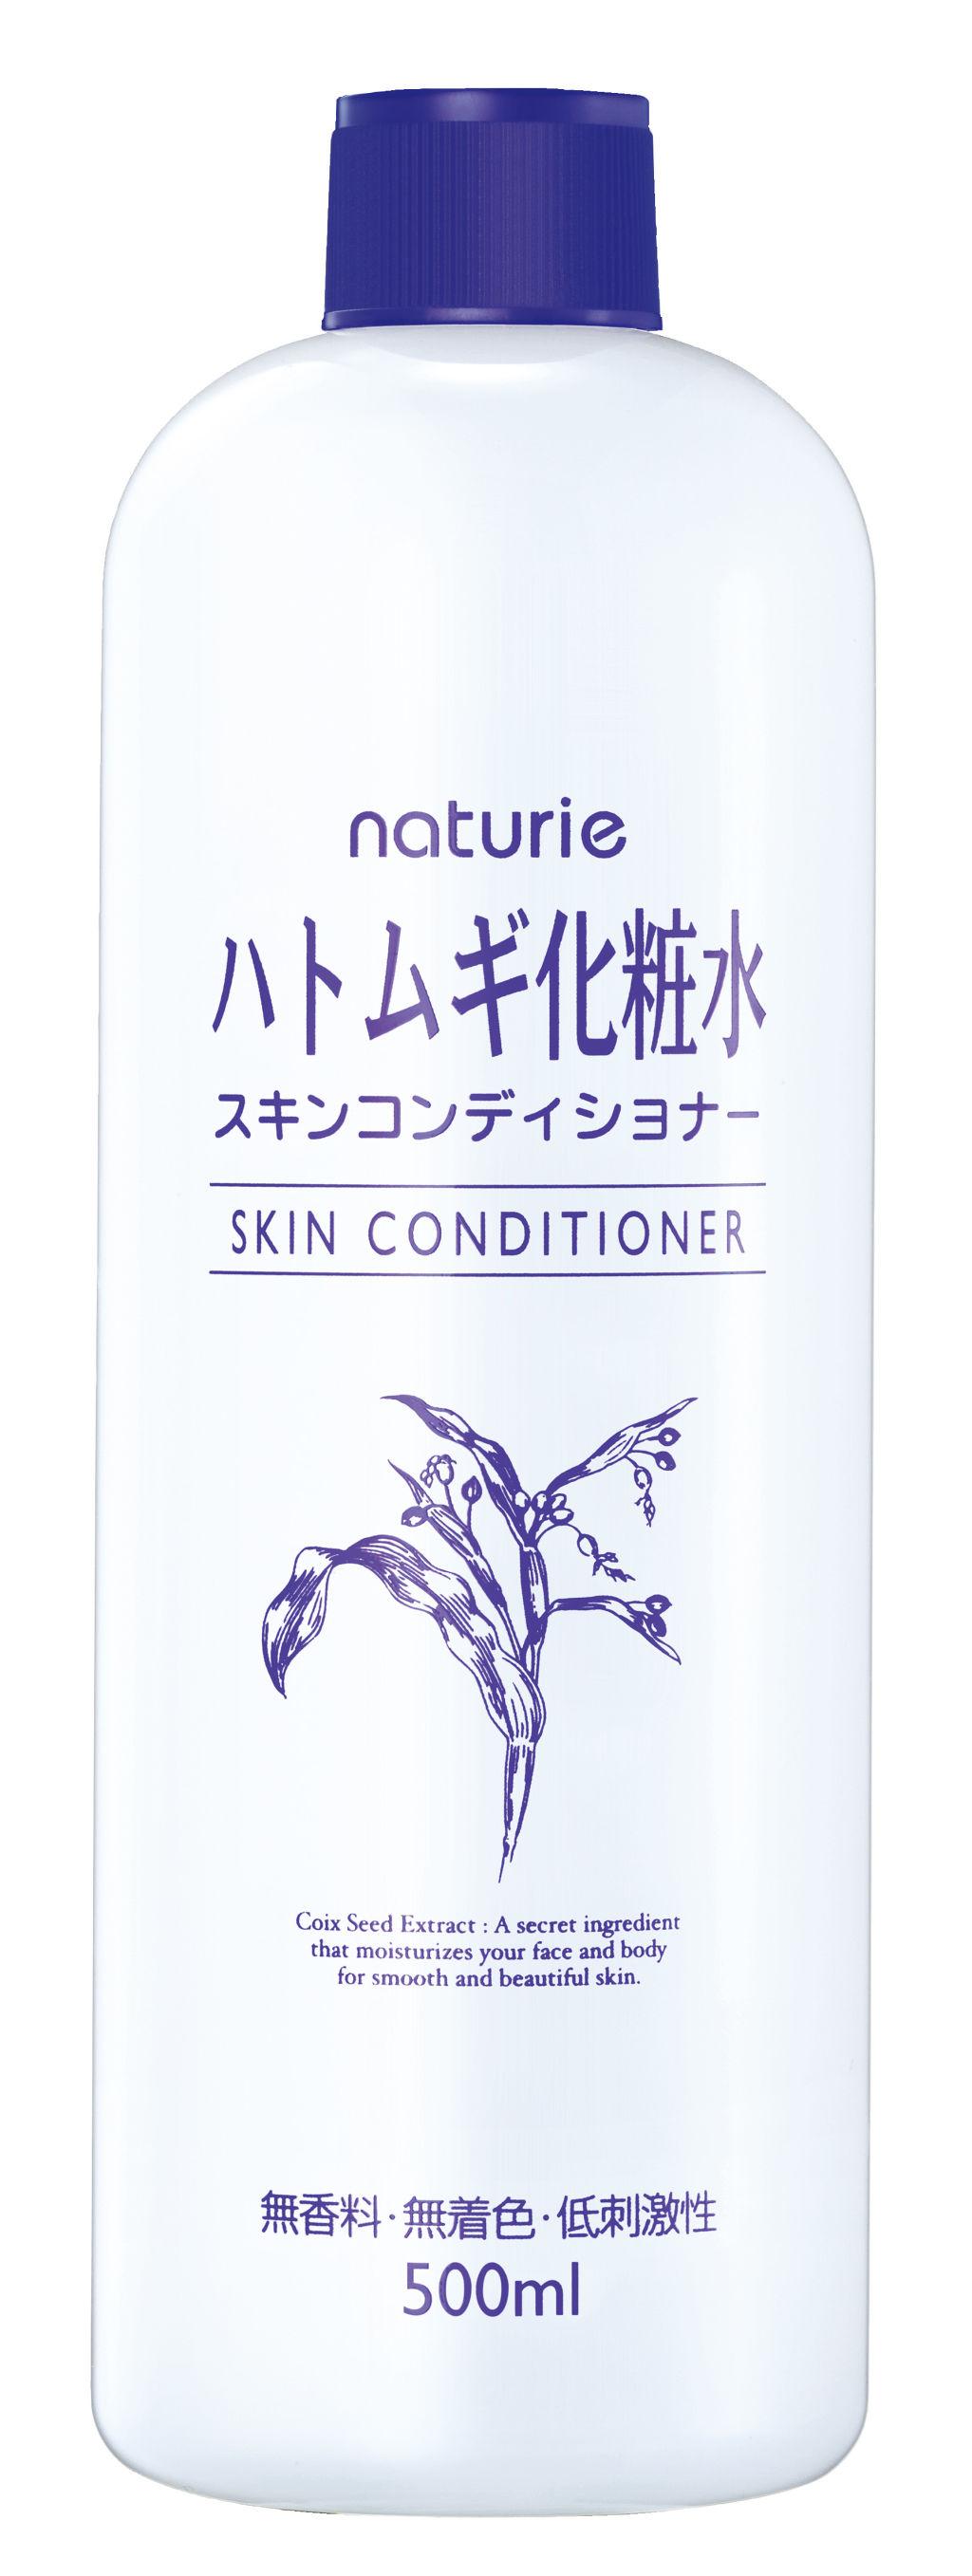 imju naturie 薏仁清潤化妝水